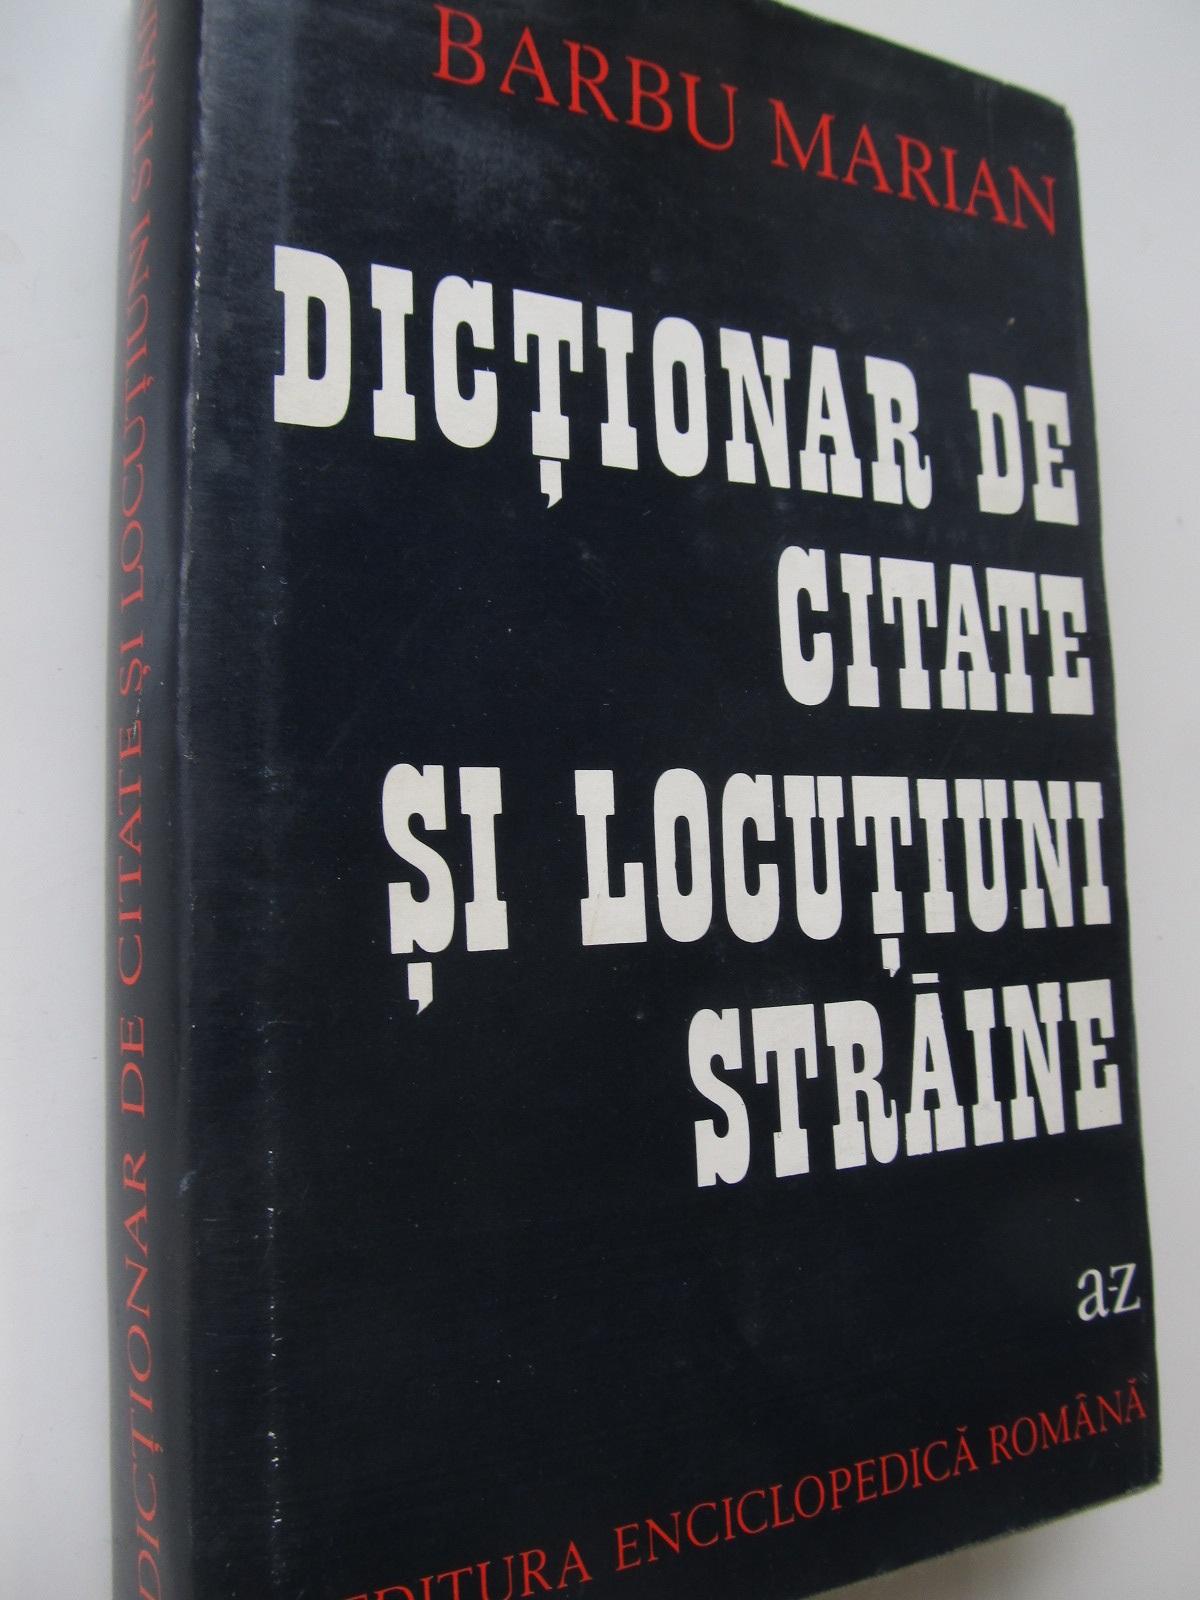 Dictionar de citate si locutiuni straine - Barbu Marian | Detalii carte